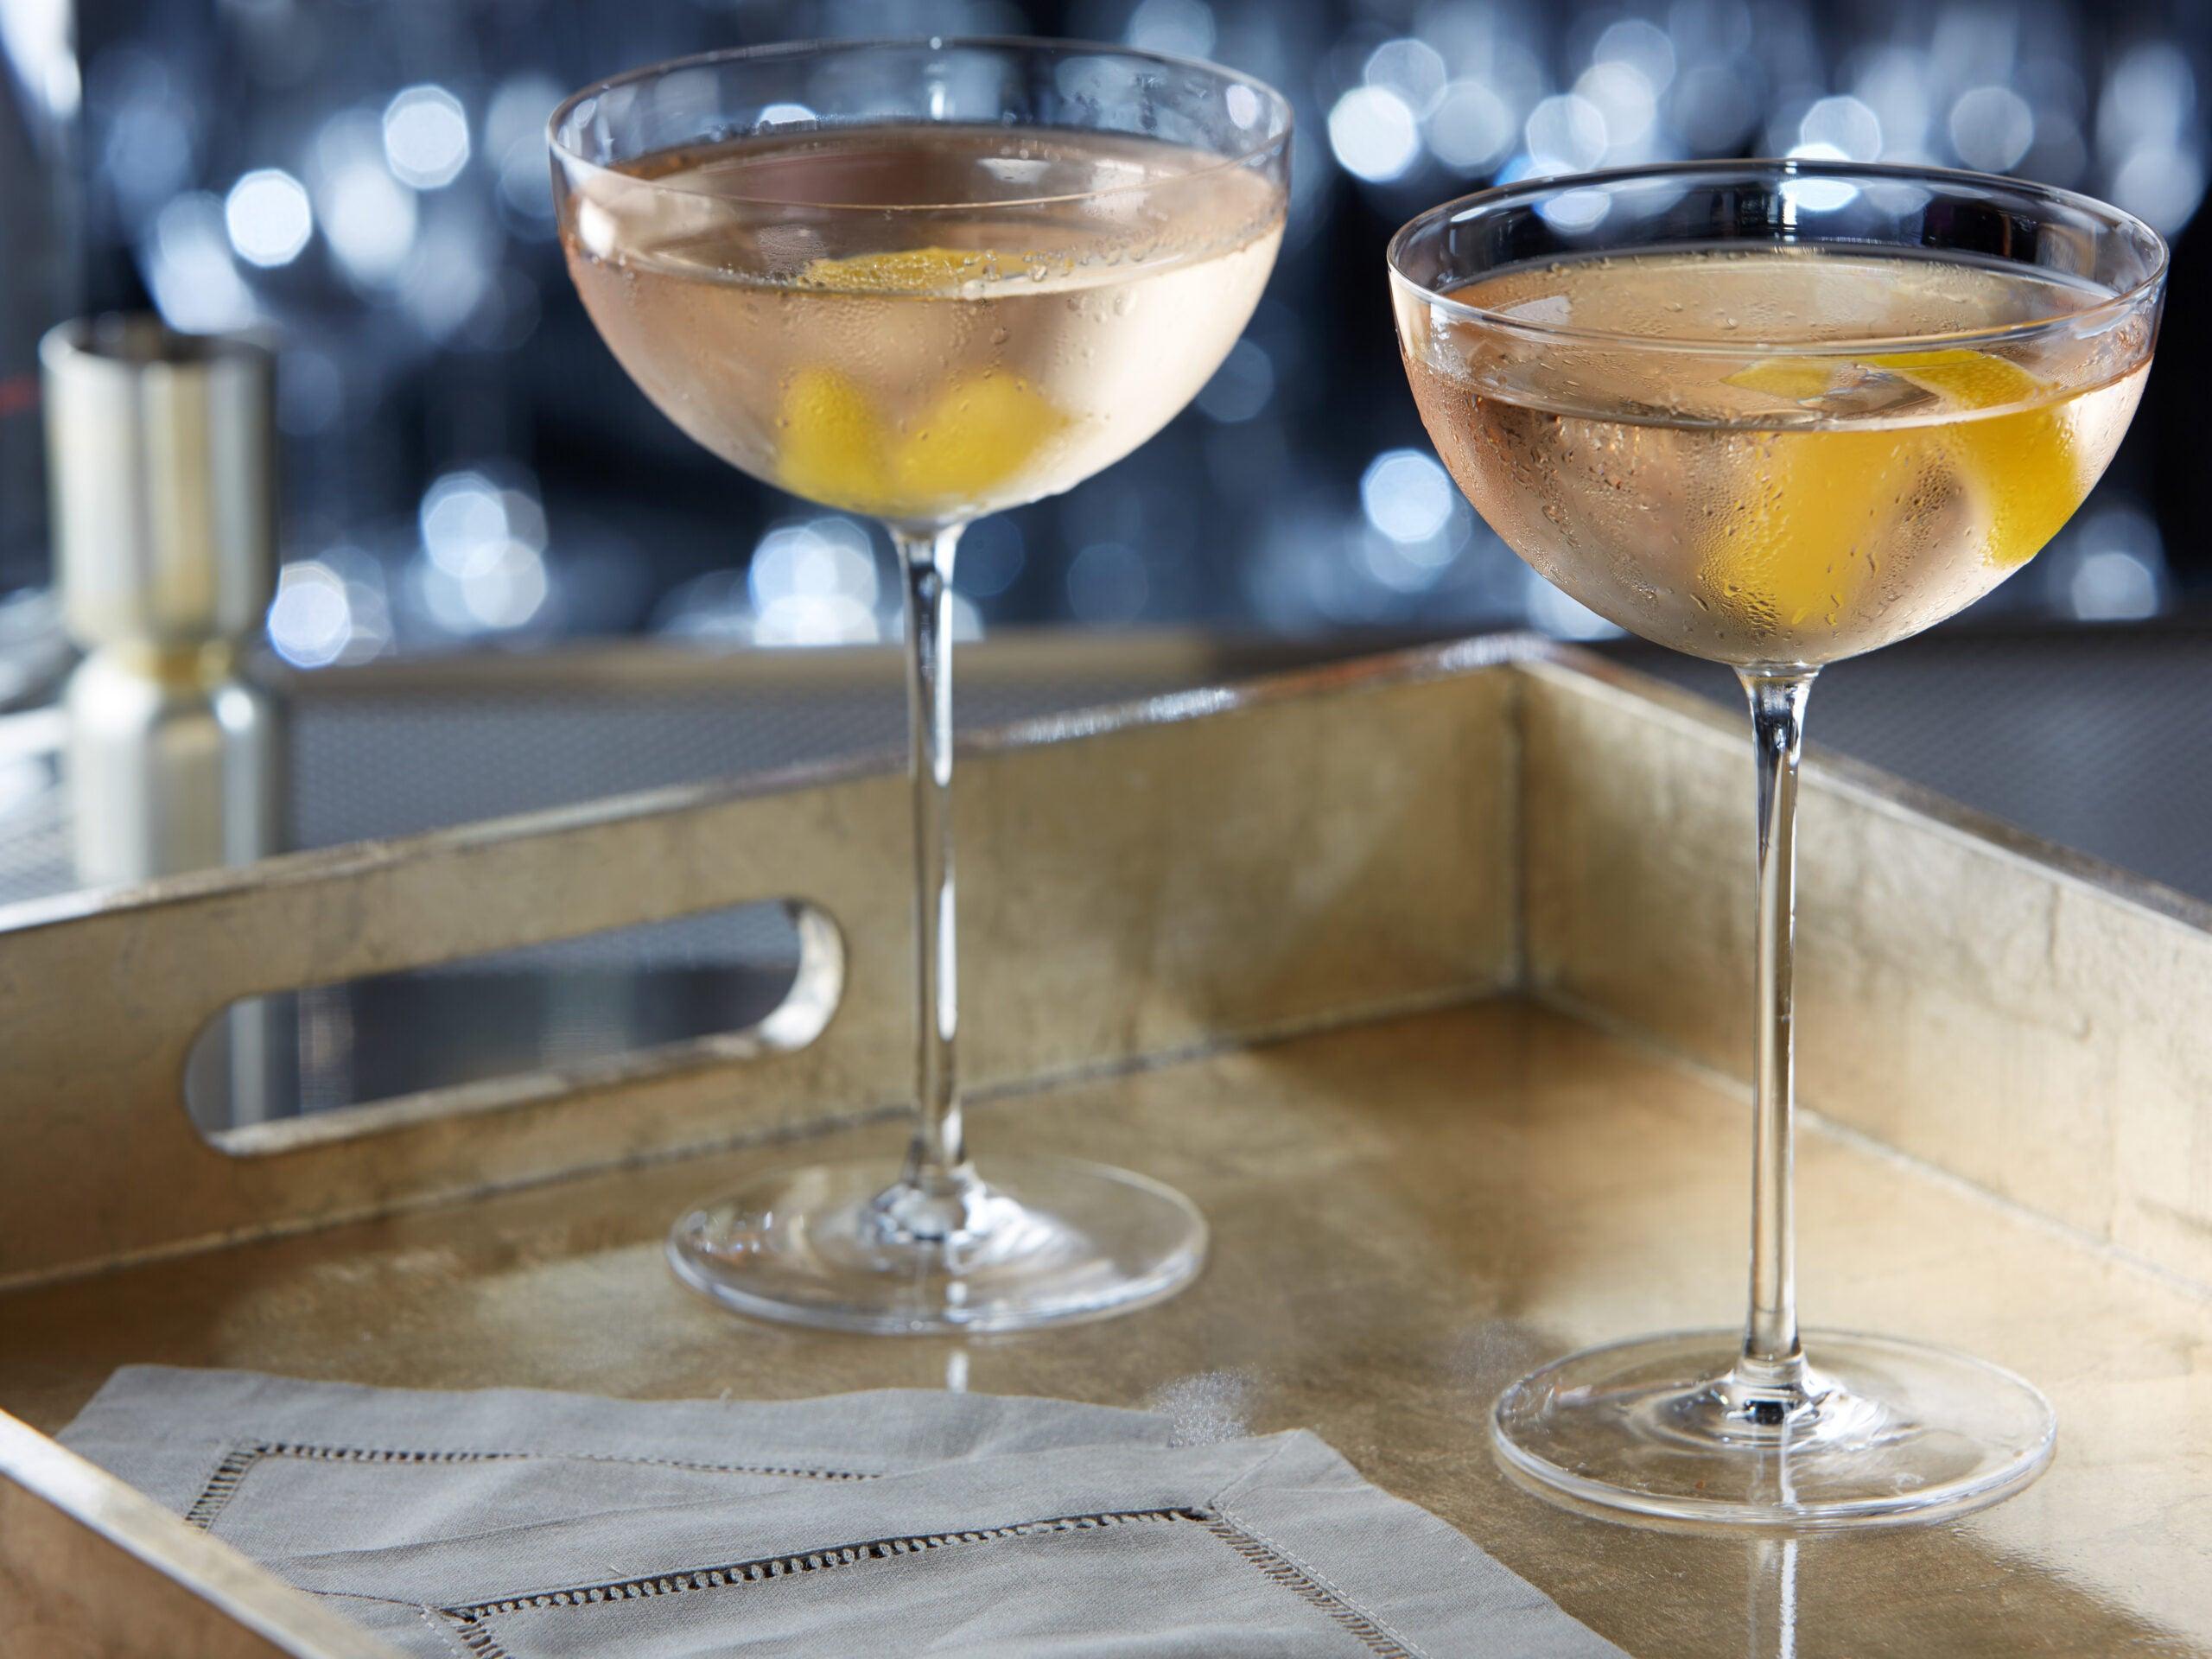 Half-Past 9 Martini